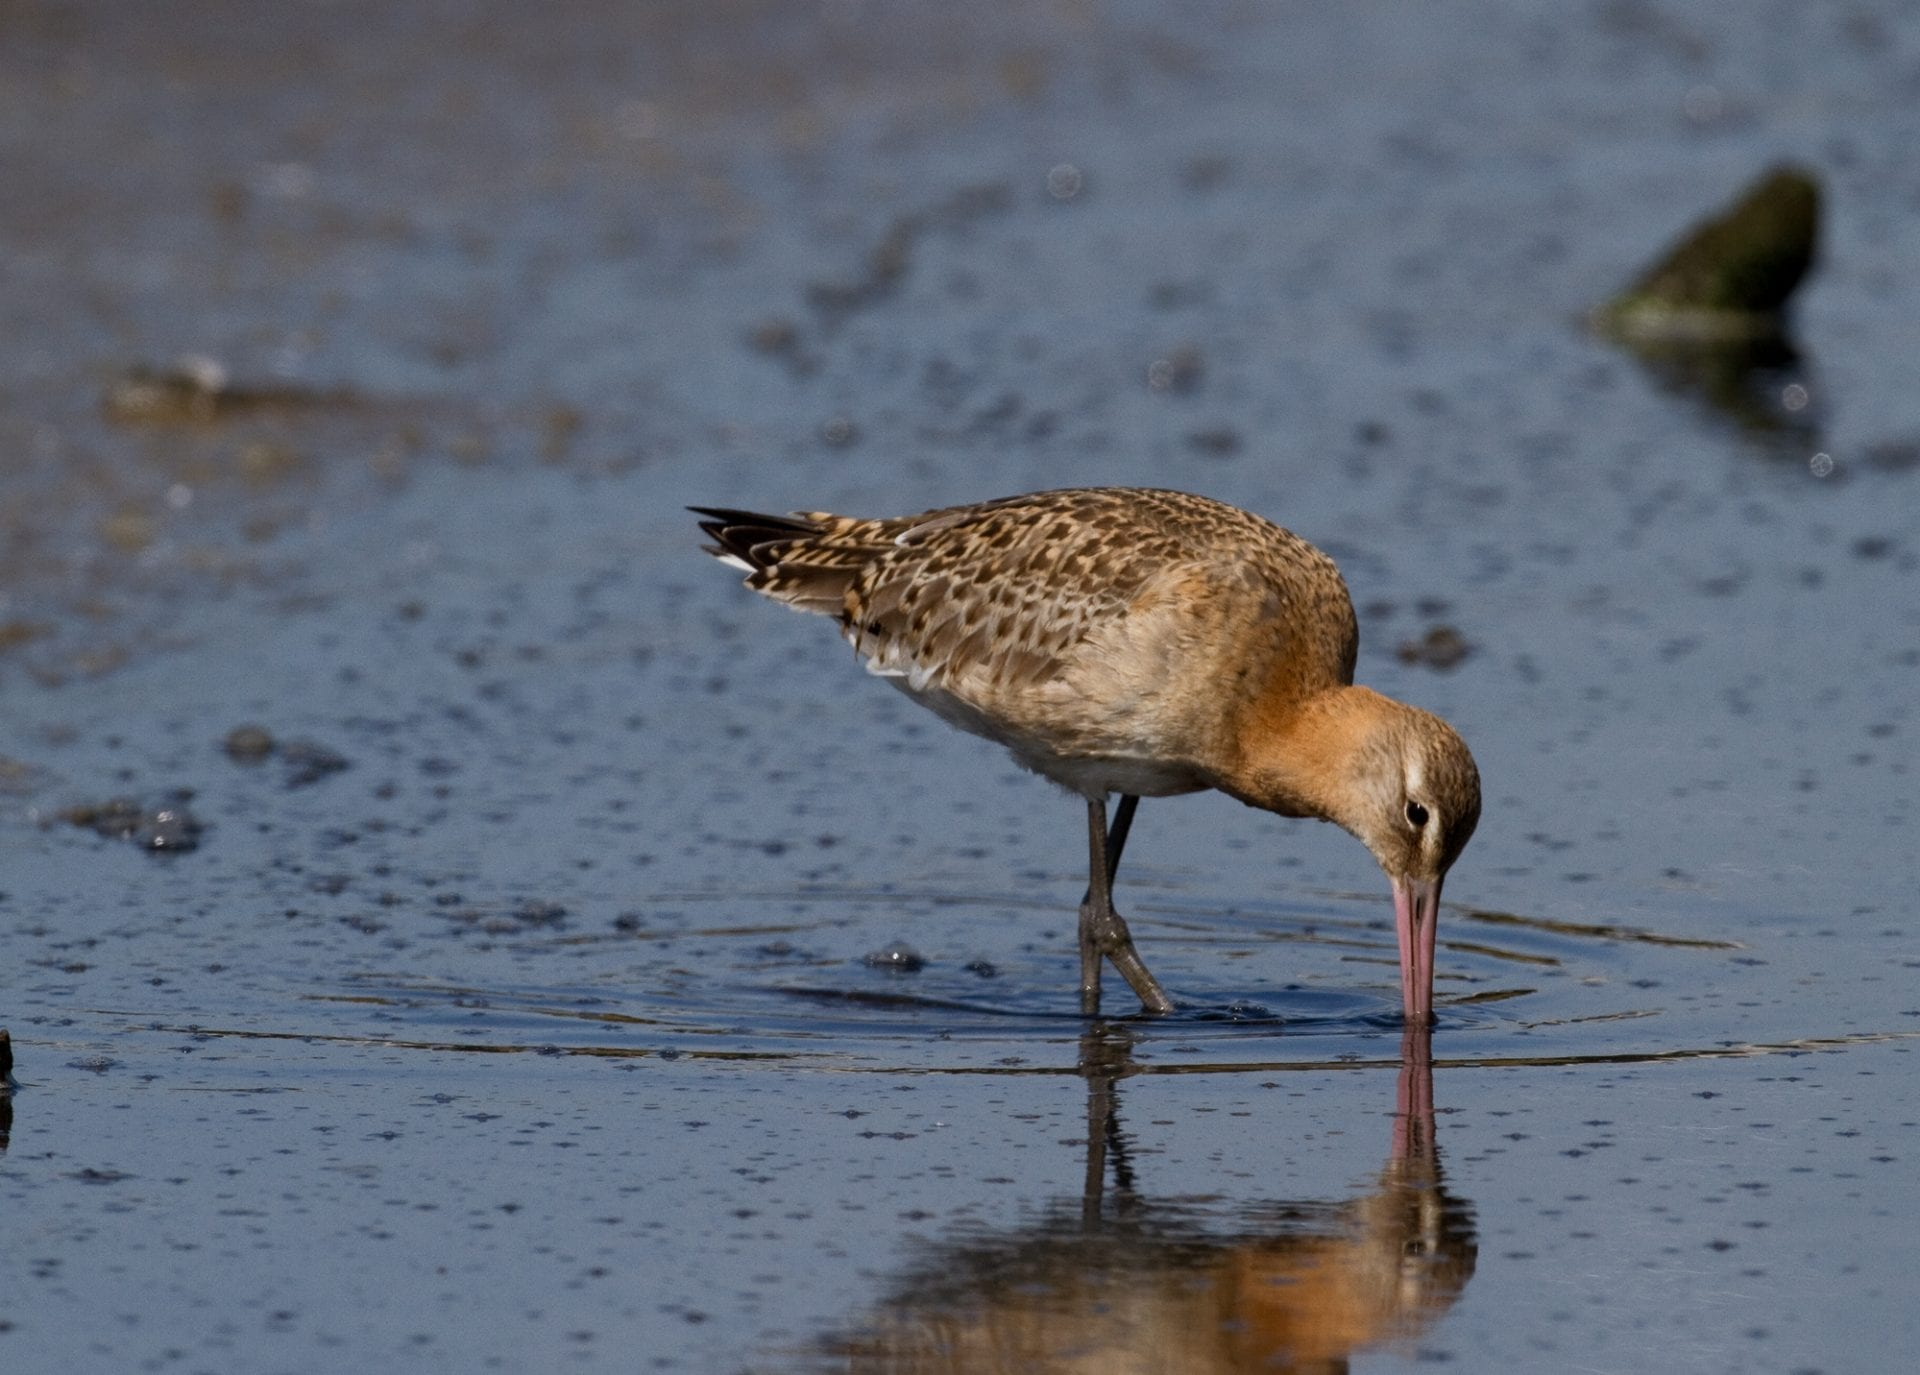 bar-tailed-godwit-probing-mud-with-long-beak